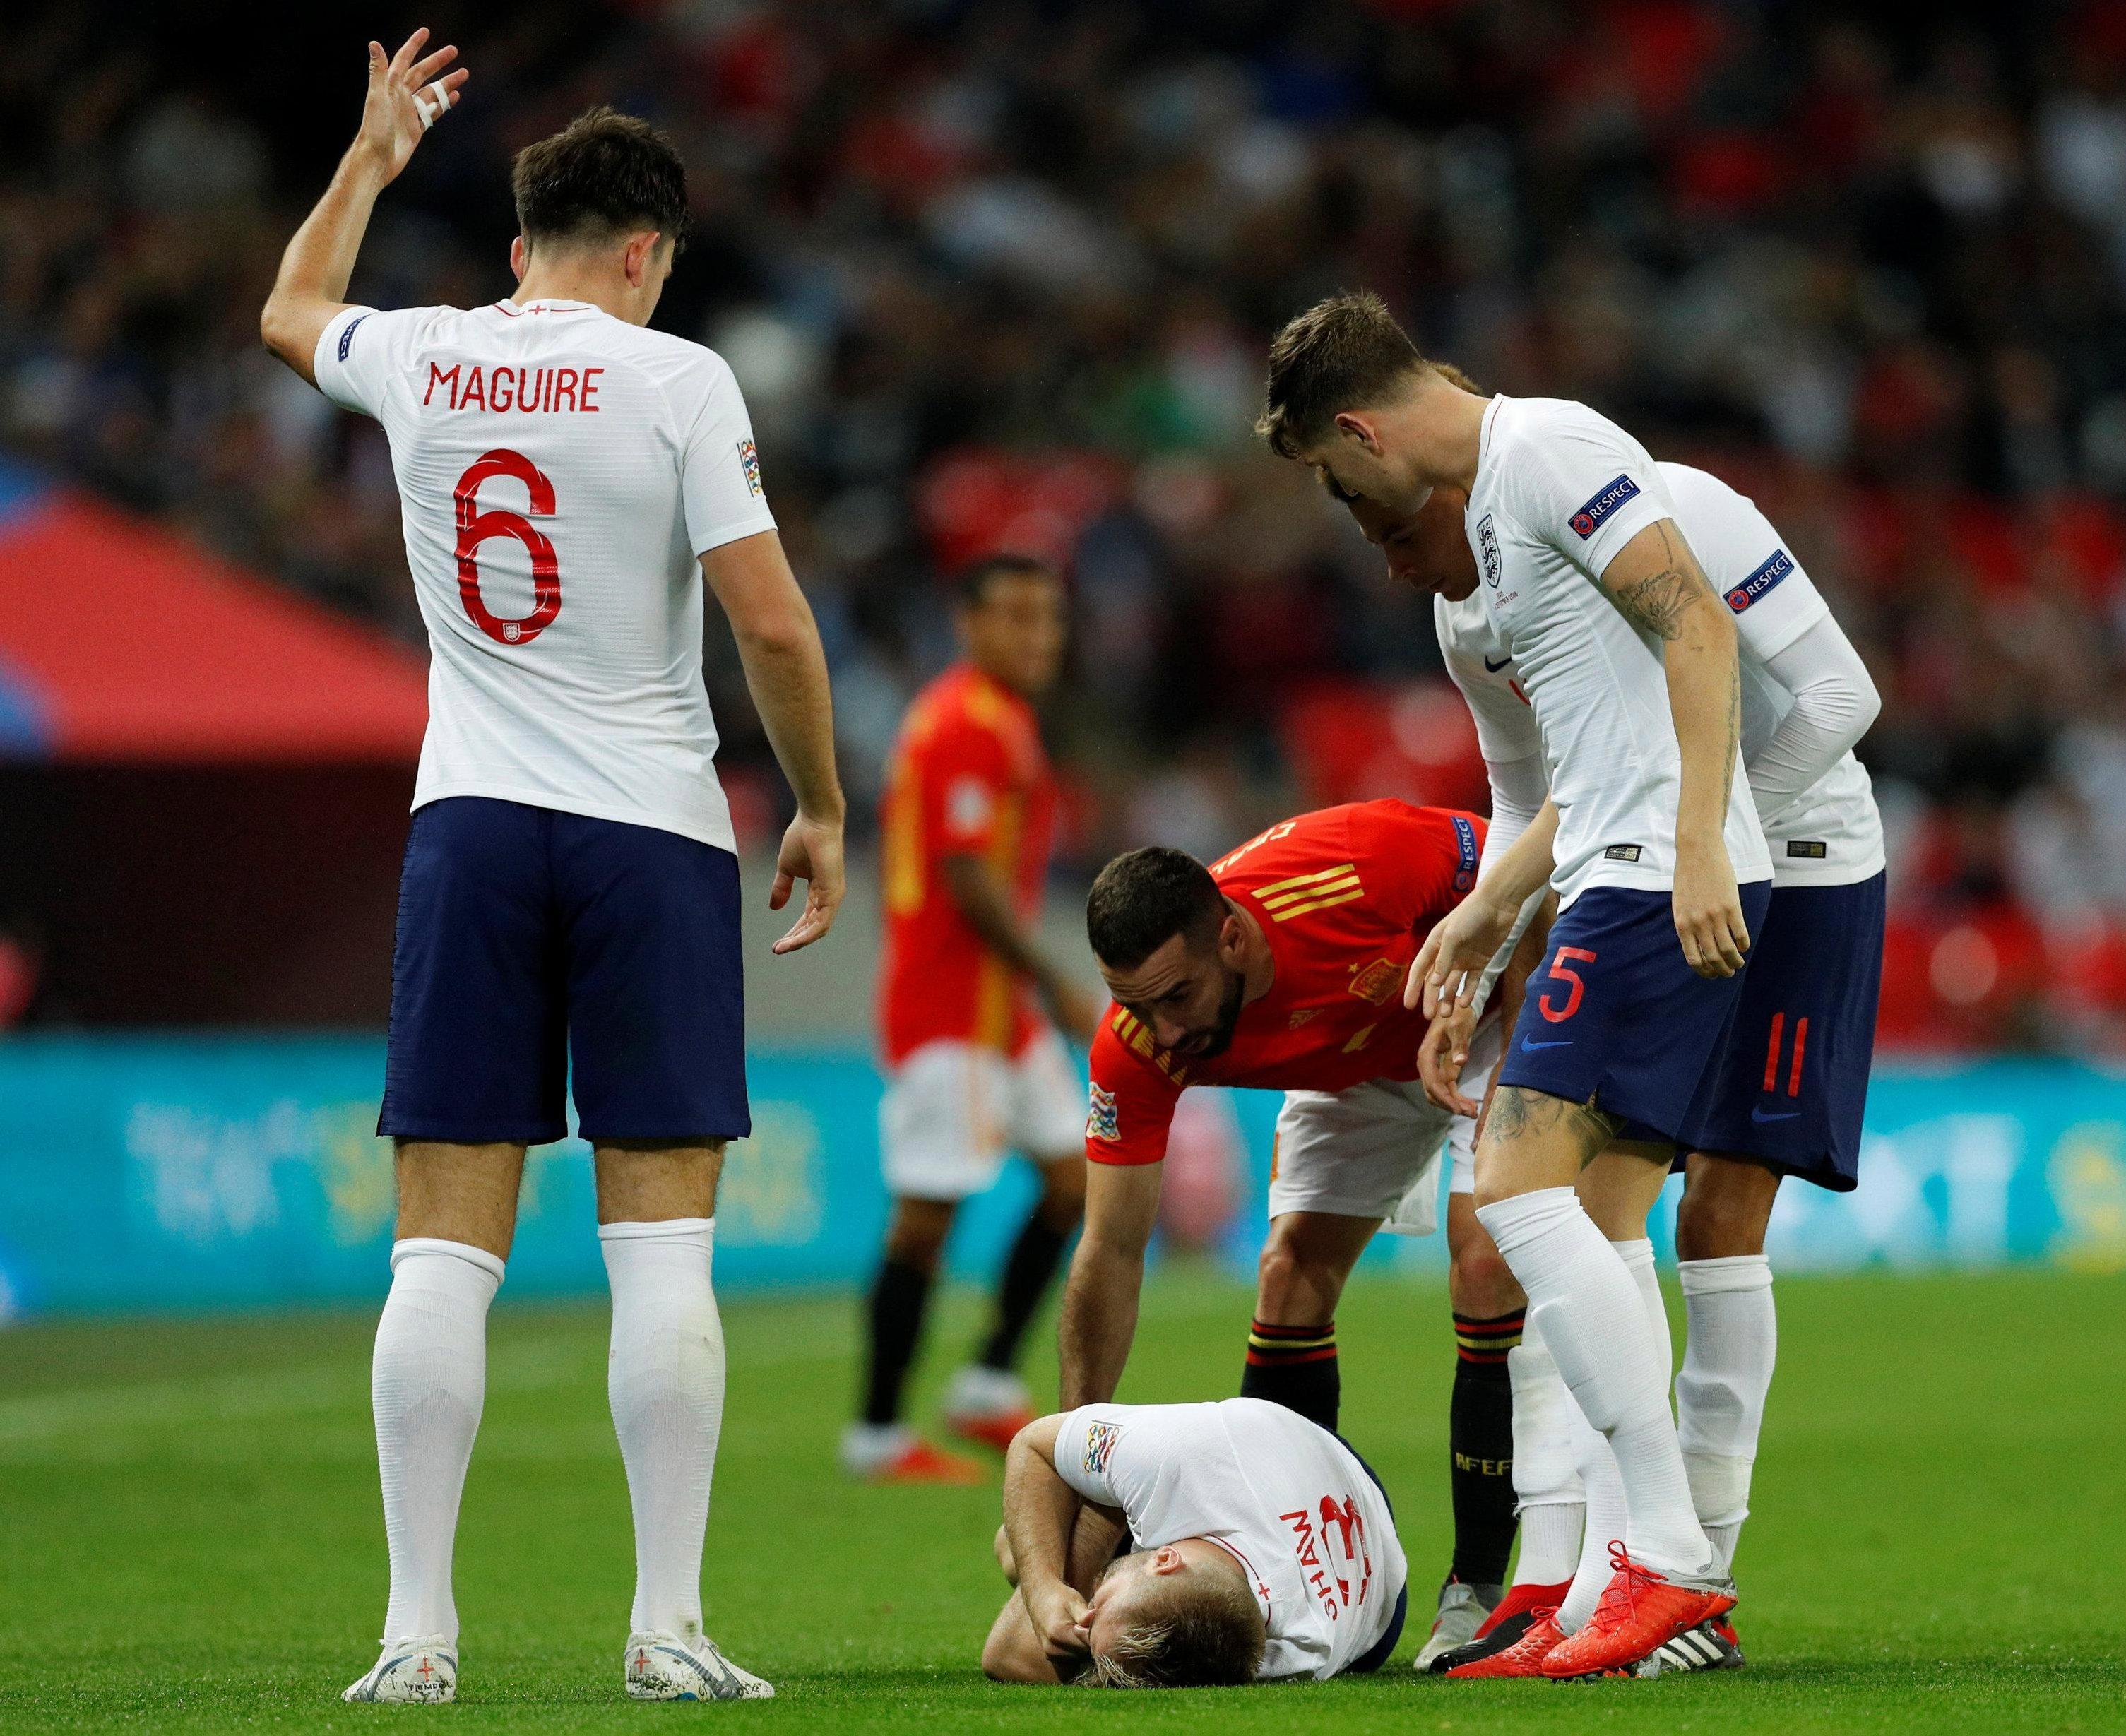 England stars Harry Maguire, John Stones and Dele Alli, plus Spain's Dani Carvajal, look on as Luke Shaw reels